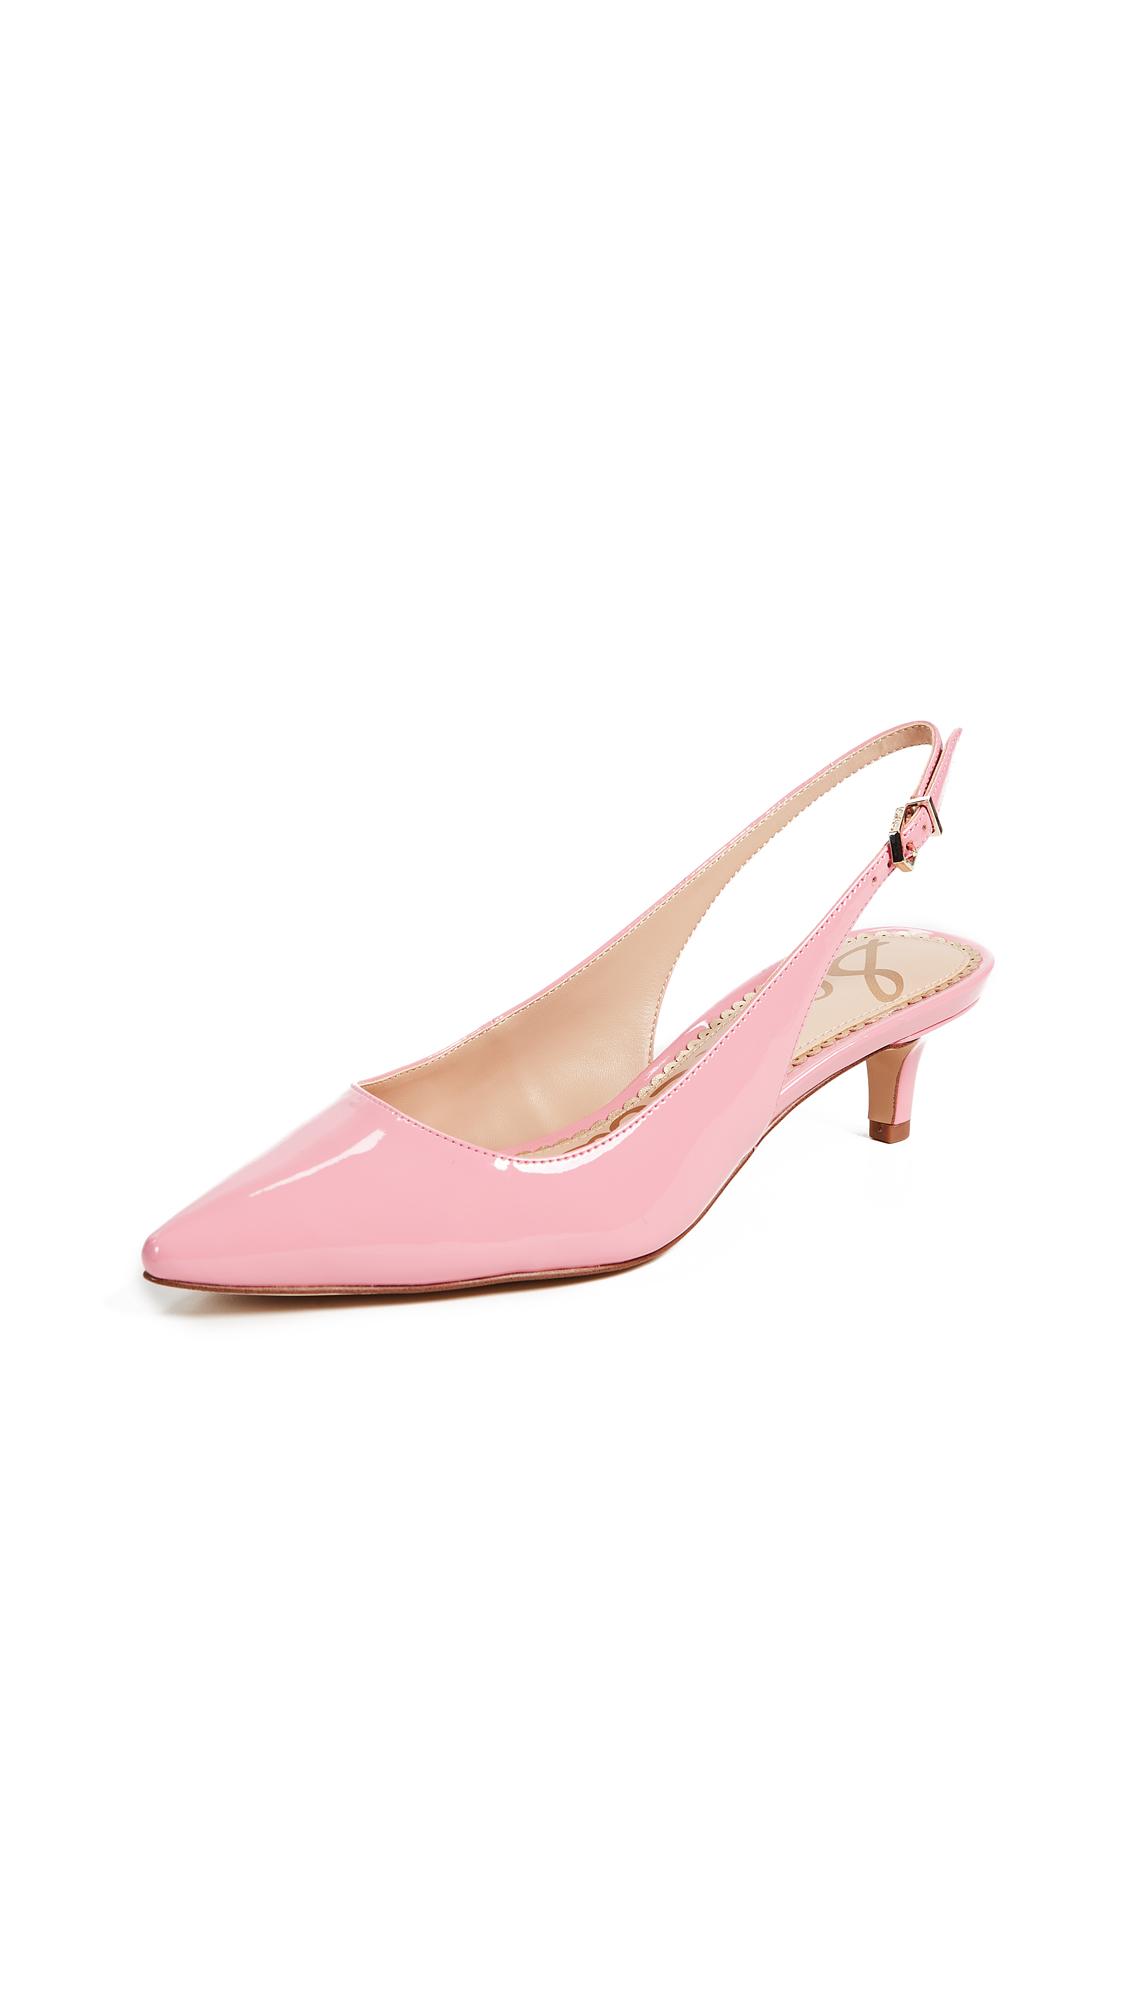 Sam Edelman Ludlow Slingback Pumps - Pink Lemonade